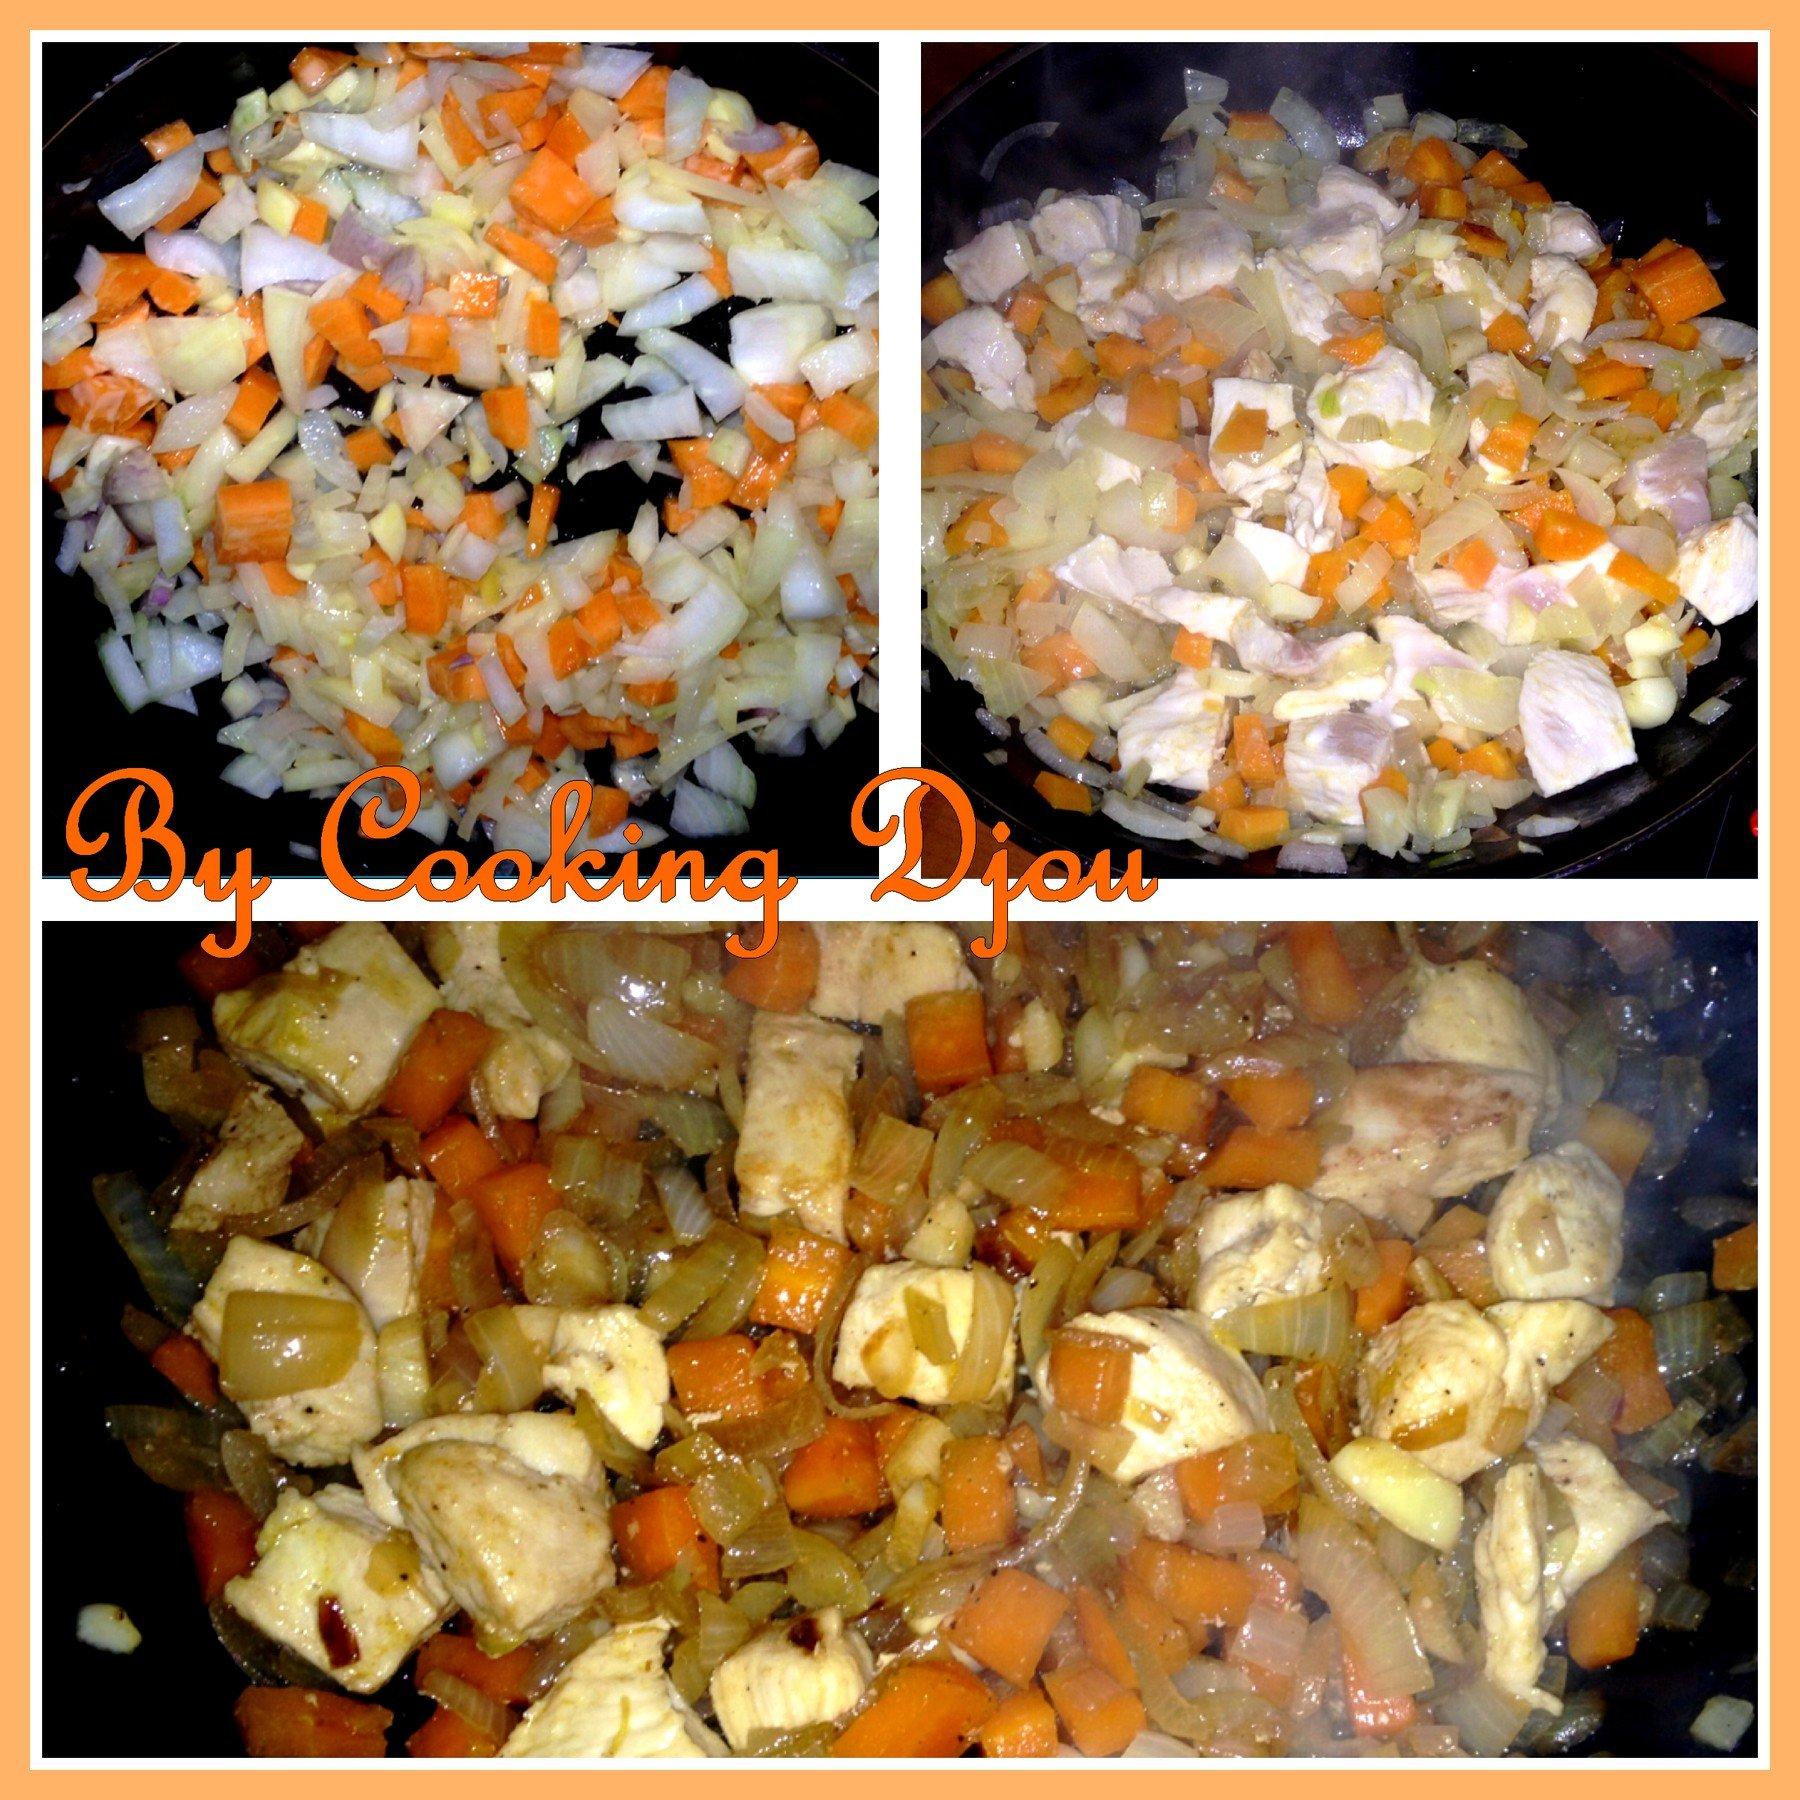 Poulet oignons carotte